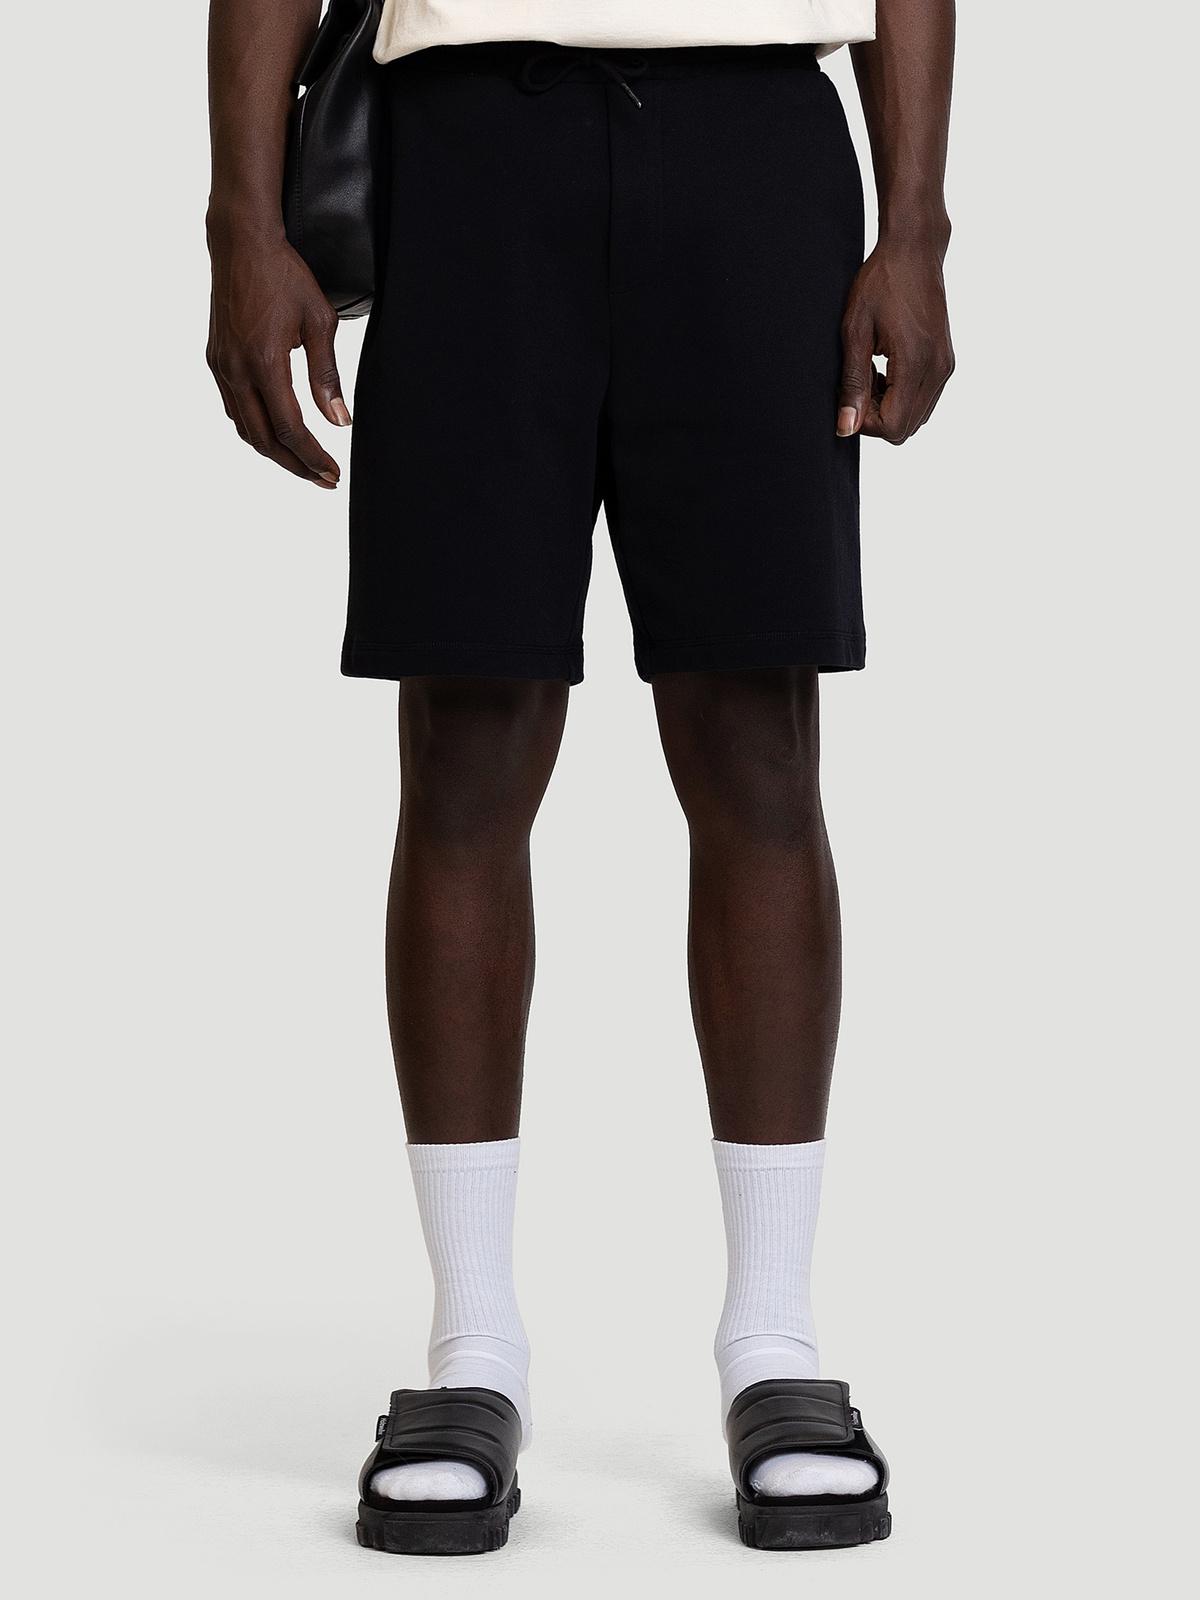 M. Oslo Shorts Black 5